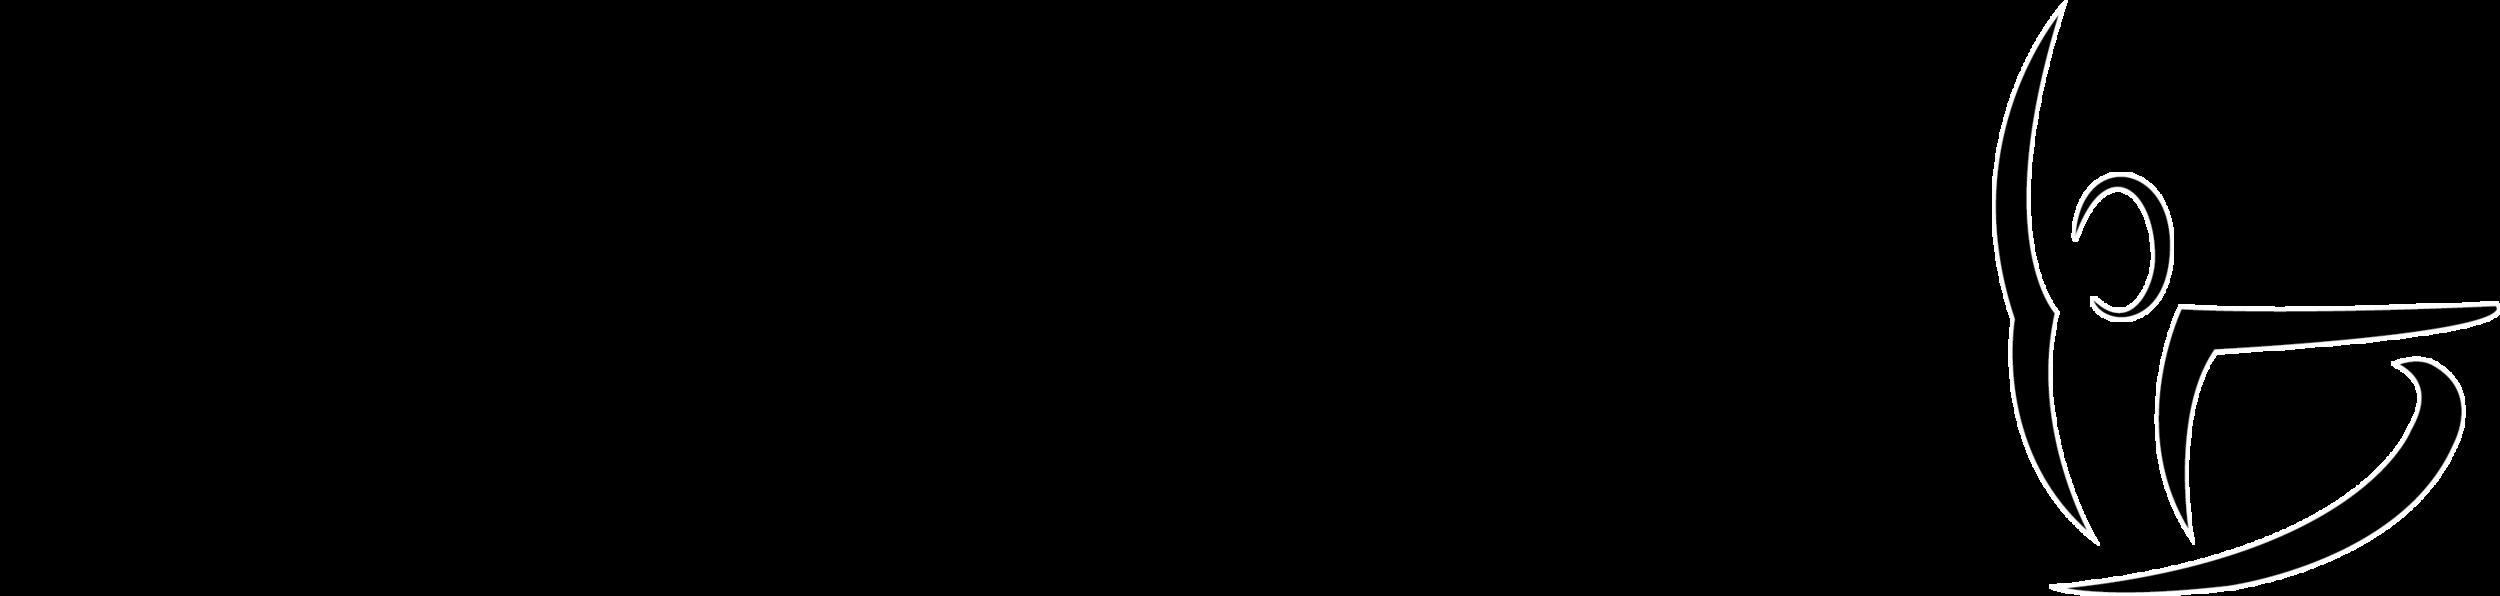 Trento-logo.jpg